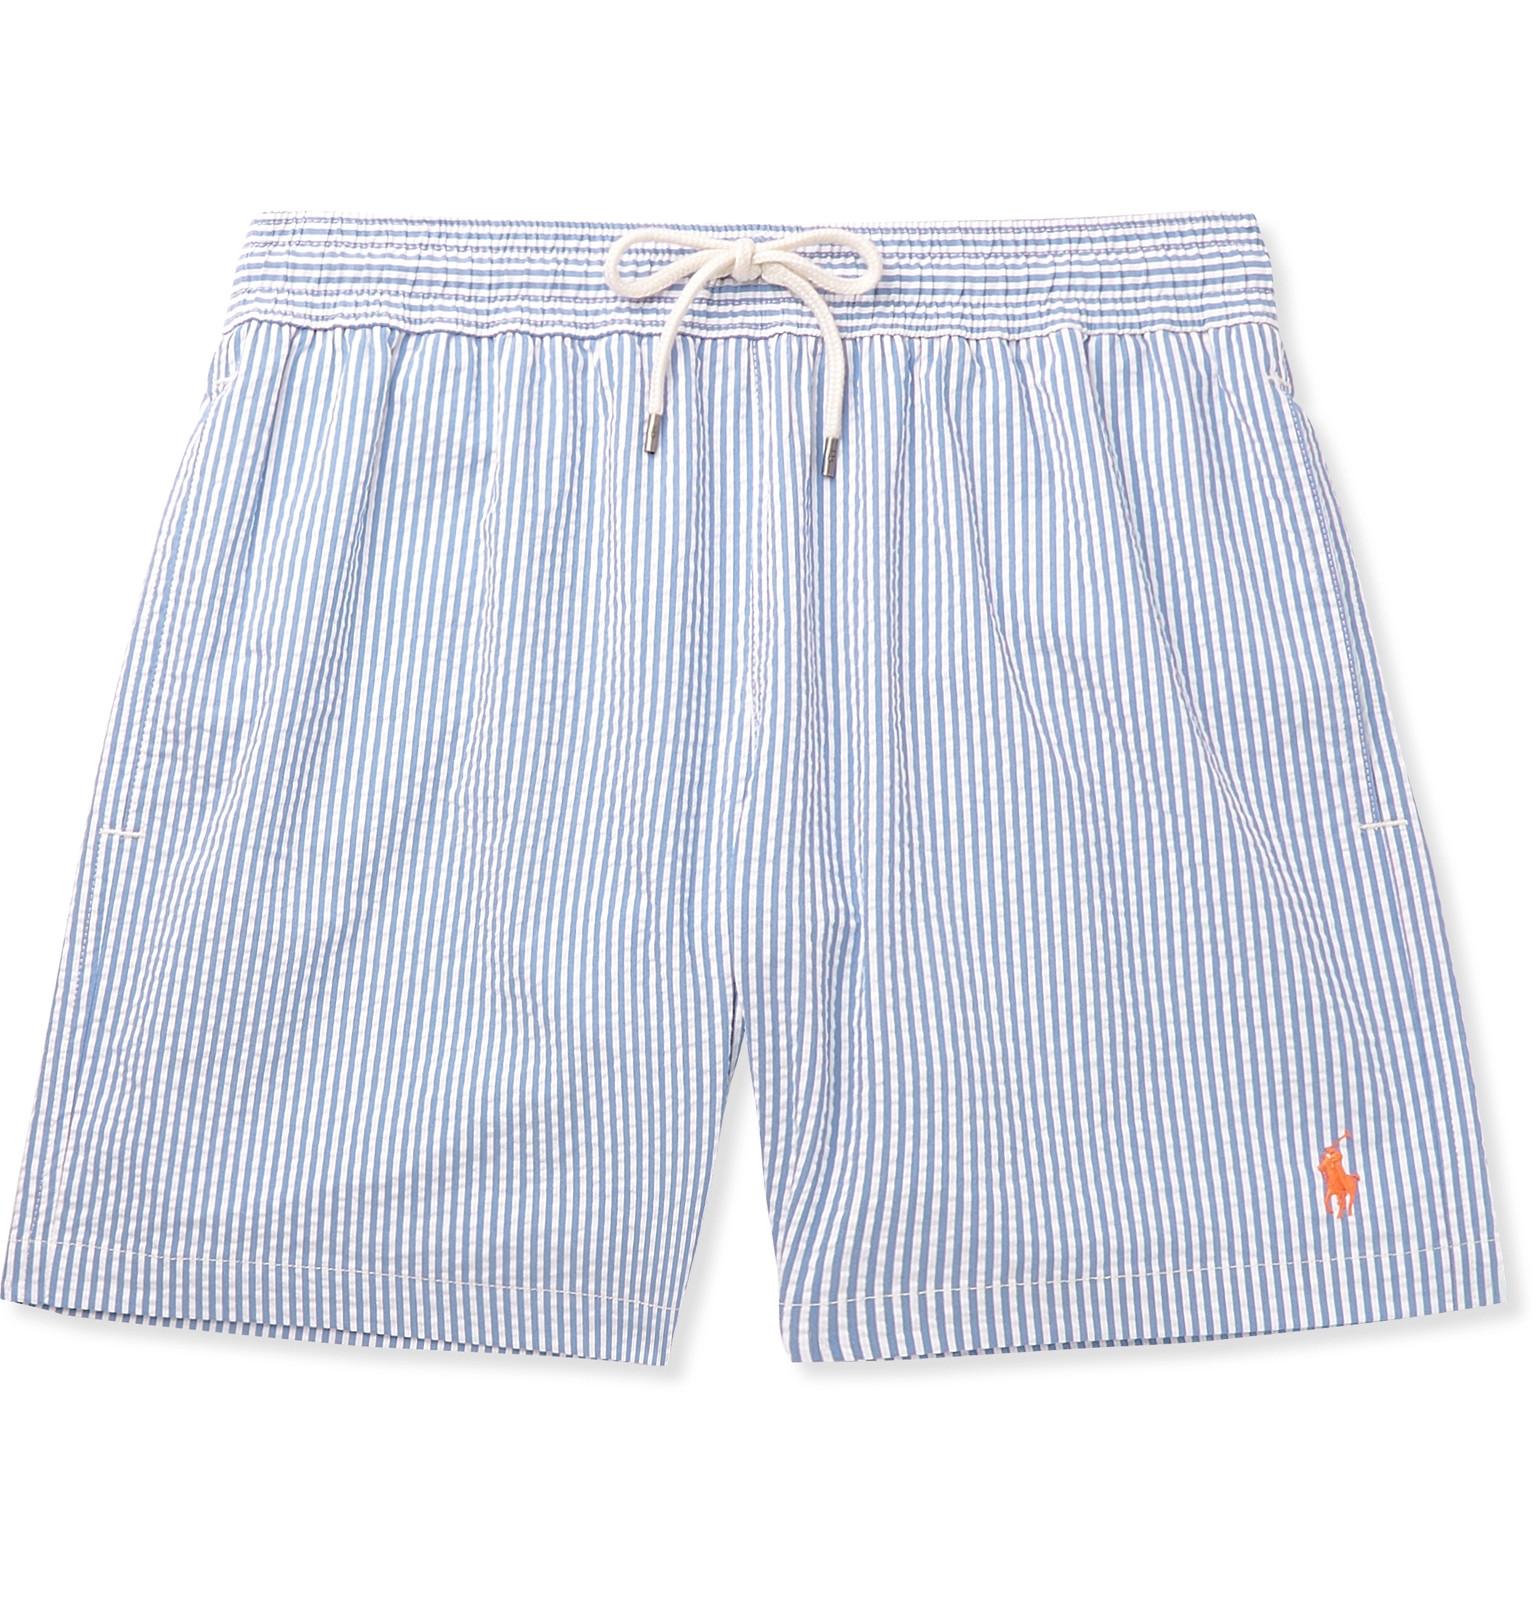 47ea00e764 Polo Ralph LaurenMid-Length Striped Cotton-Blend Seersucker Swim Shorts